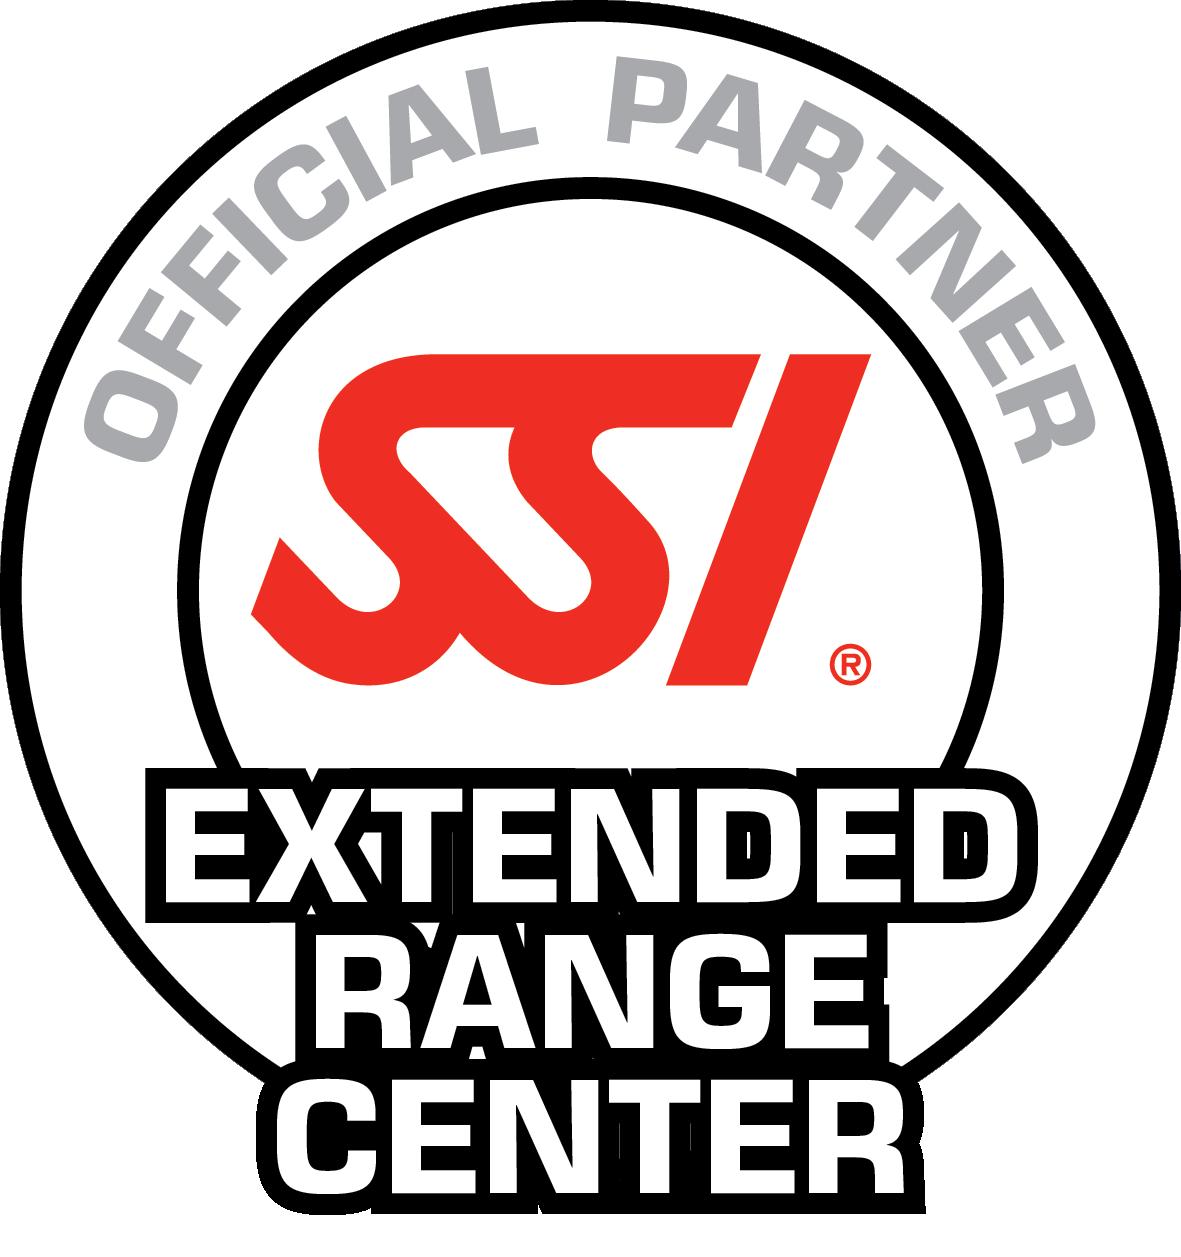 SSI_LOGO_Extended_Range_Center_RGB.png